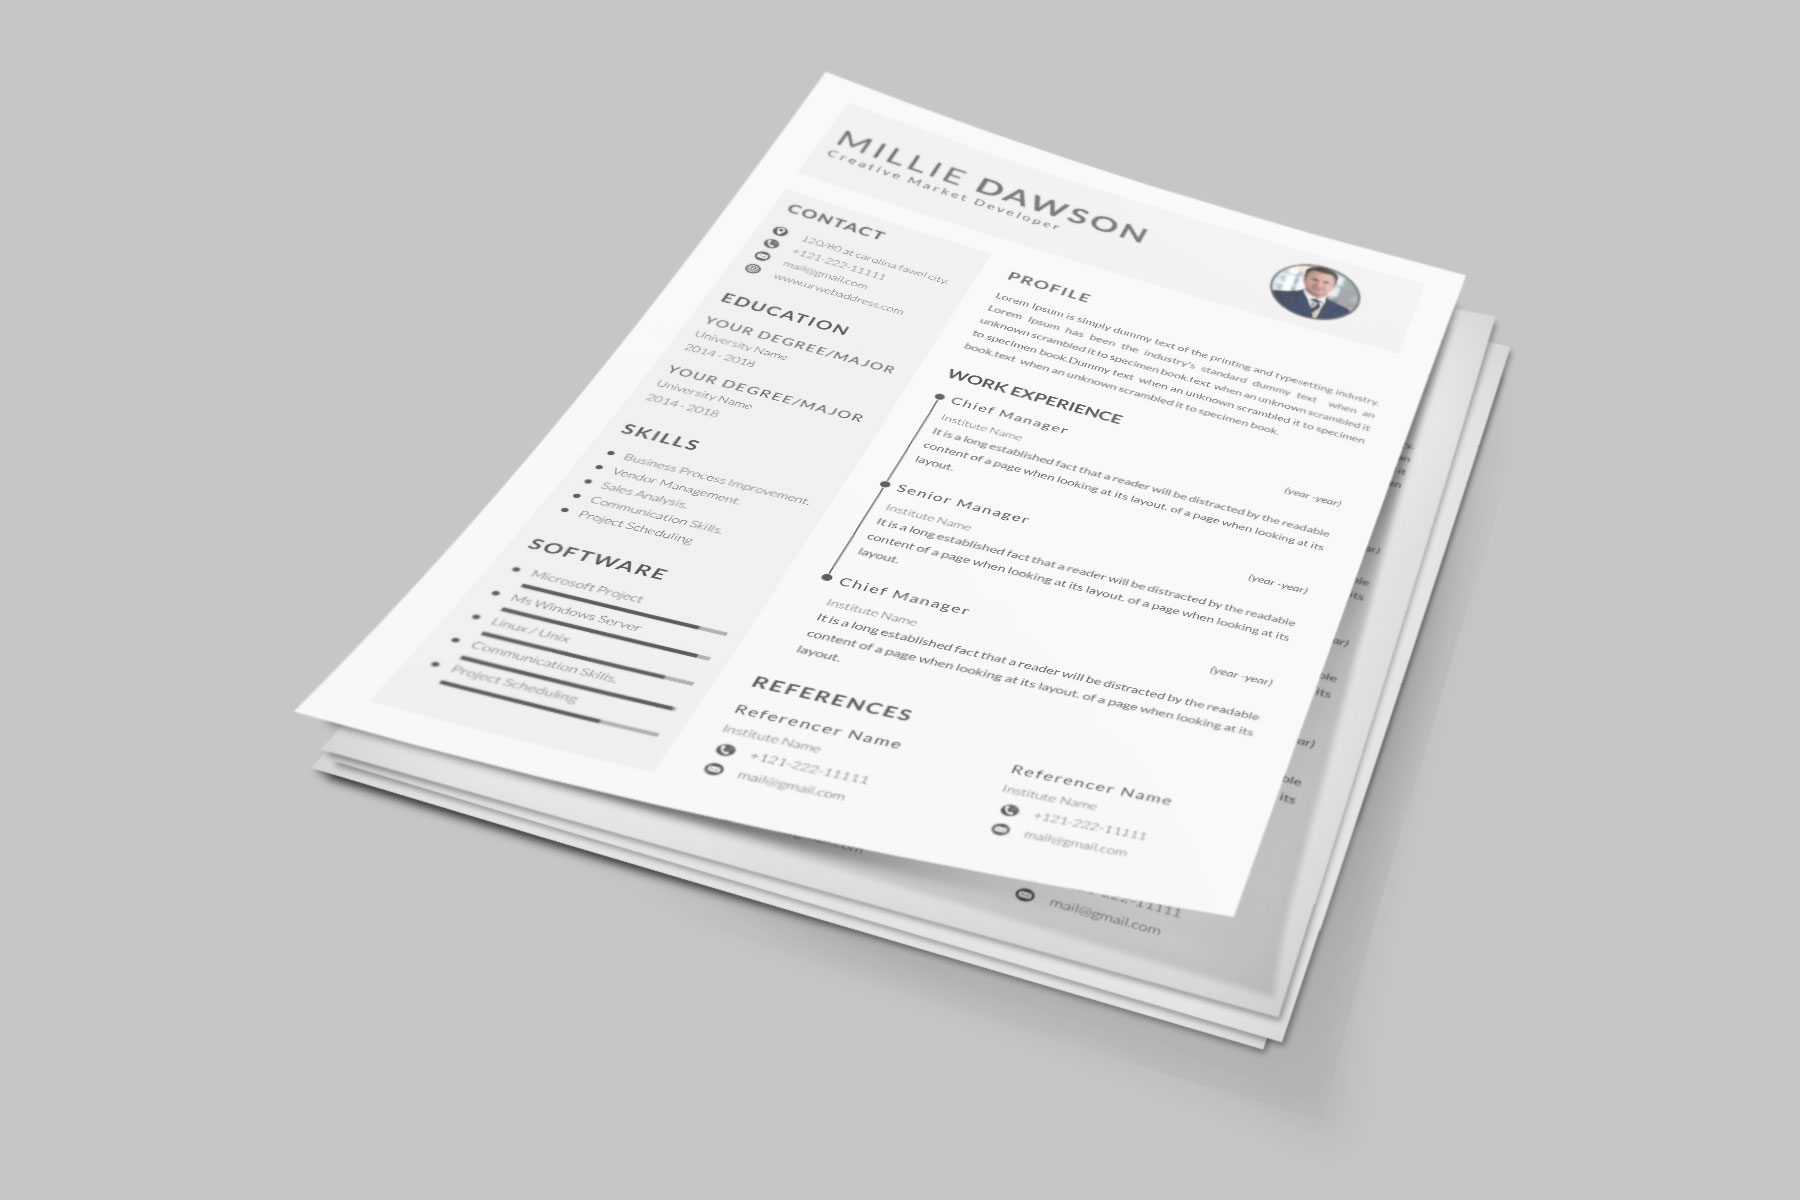 Professional Cv Resume Bonus business card Word/PSD,AI example image 6